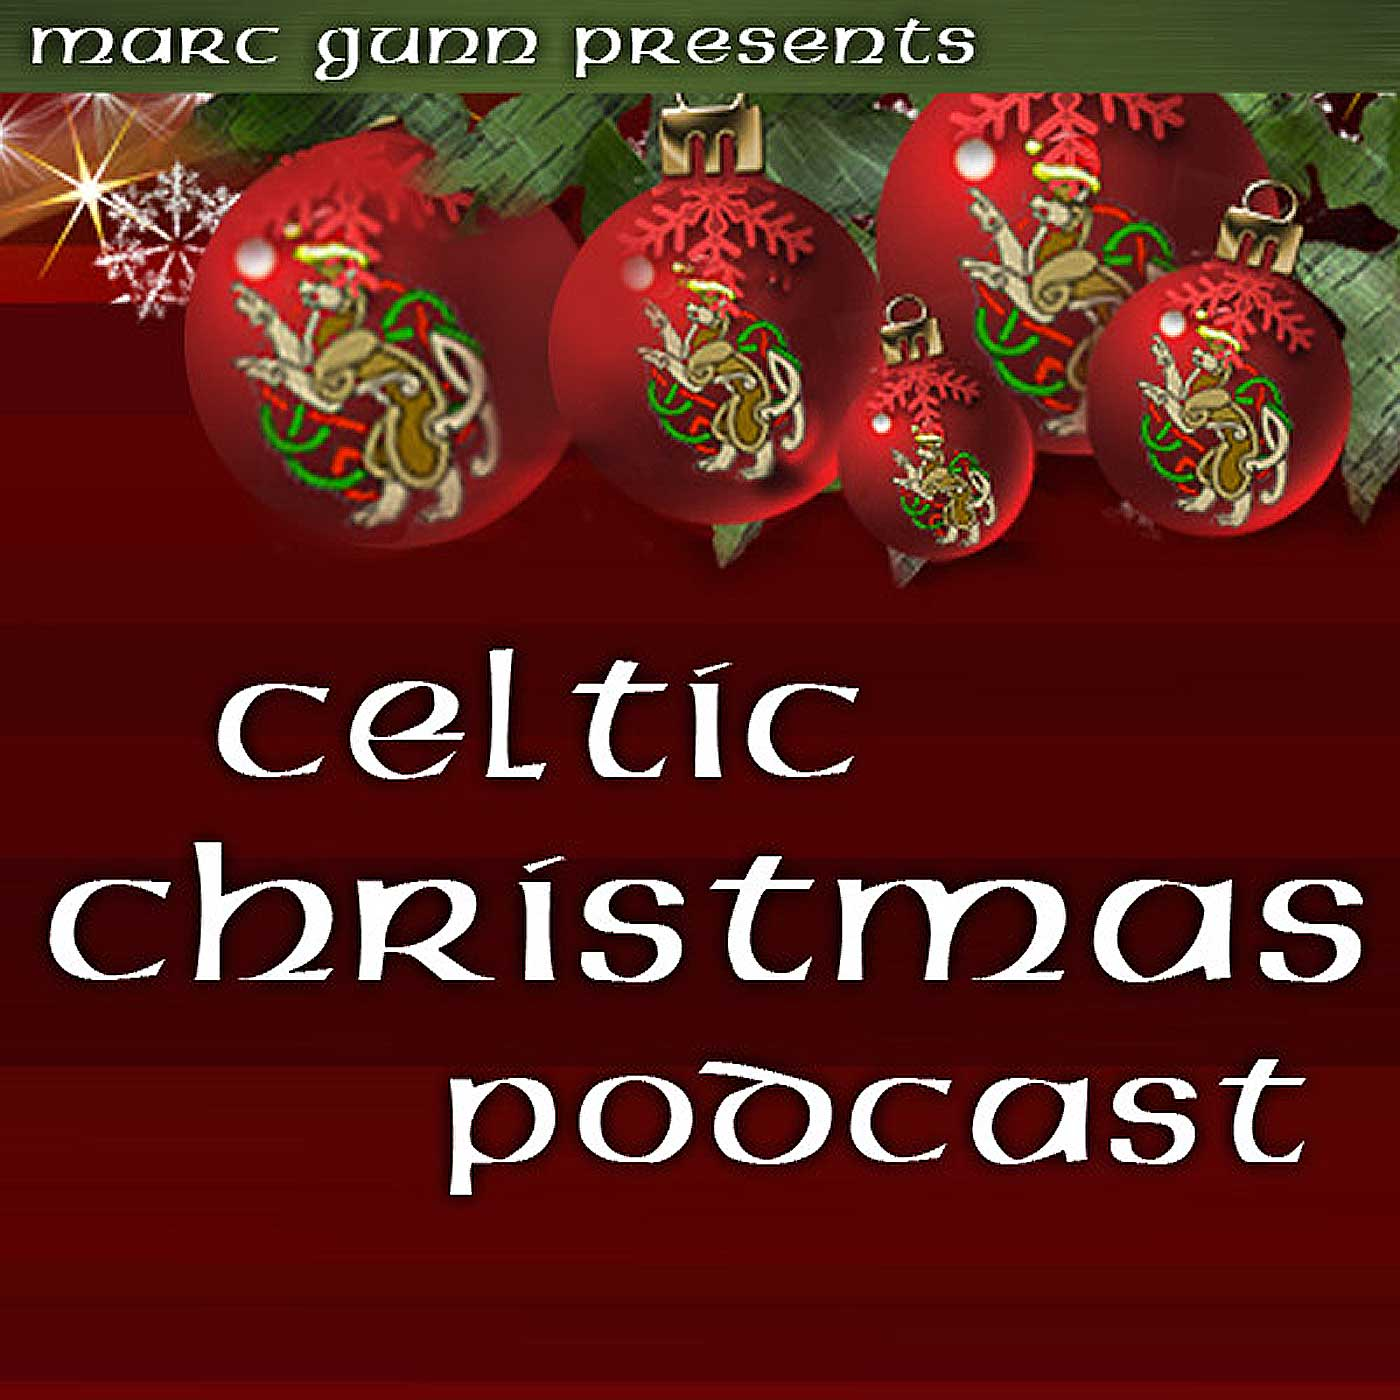 Celtic Christmas Podcast show art